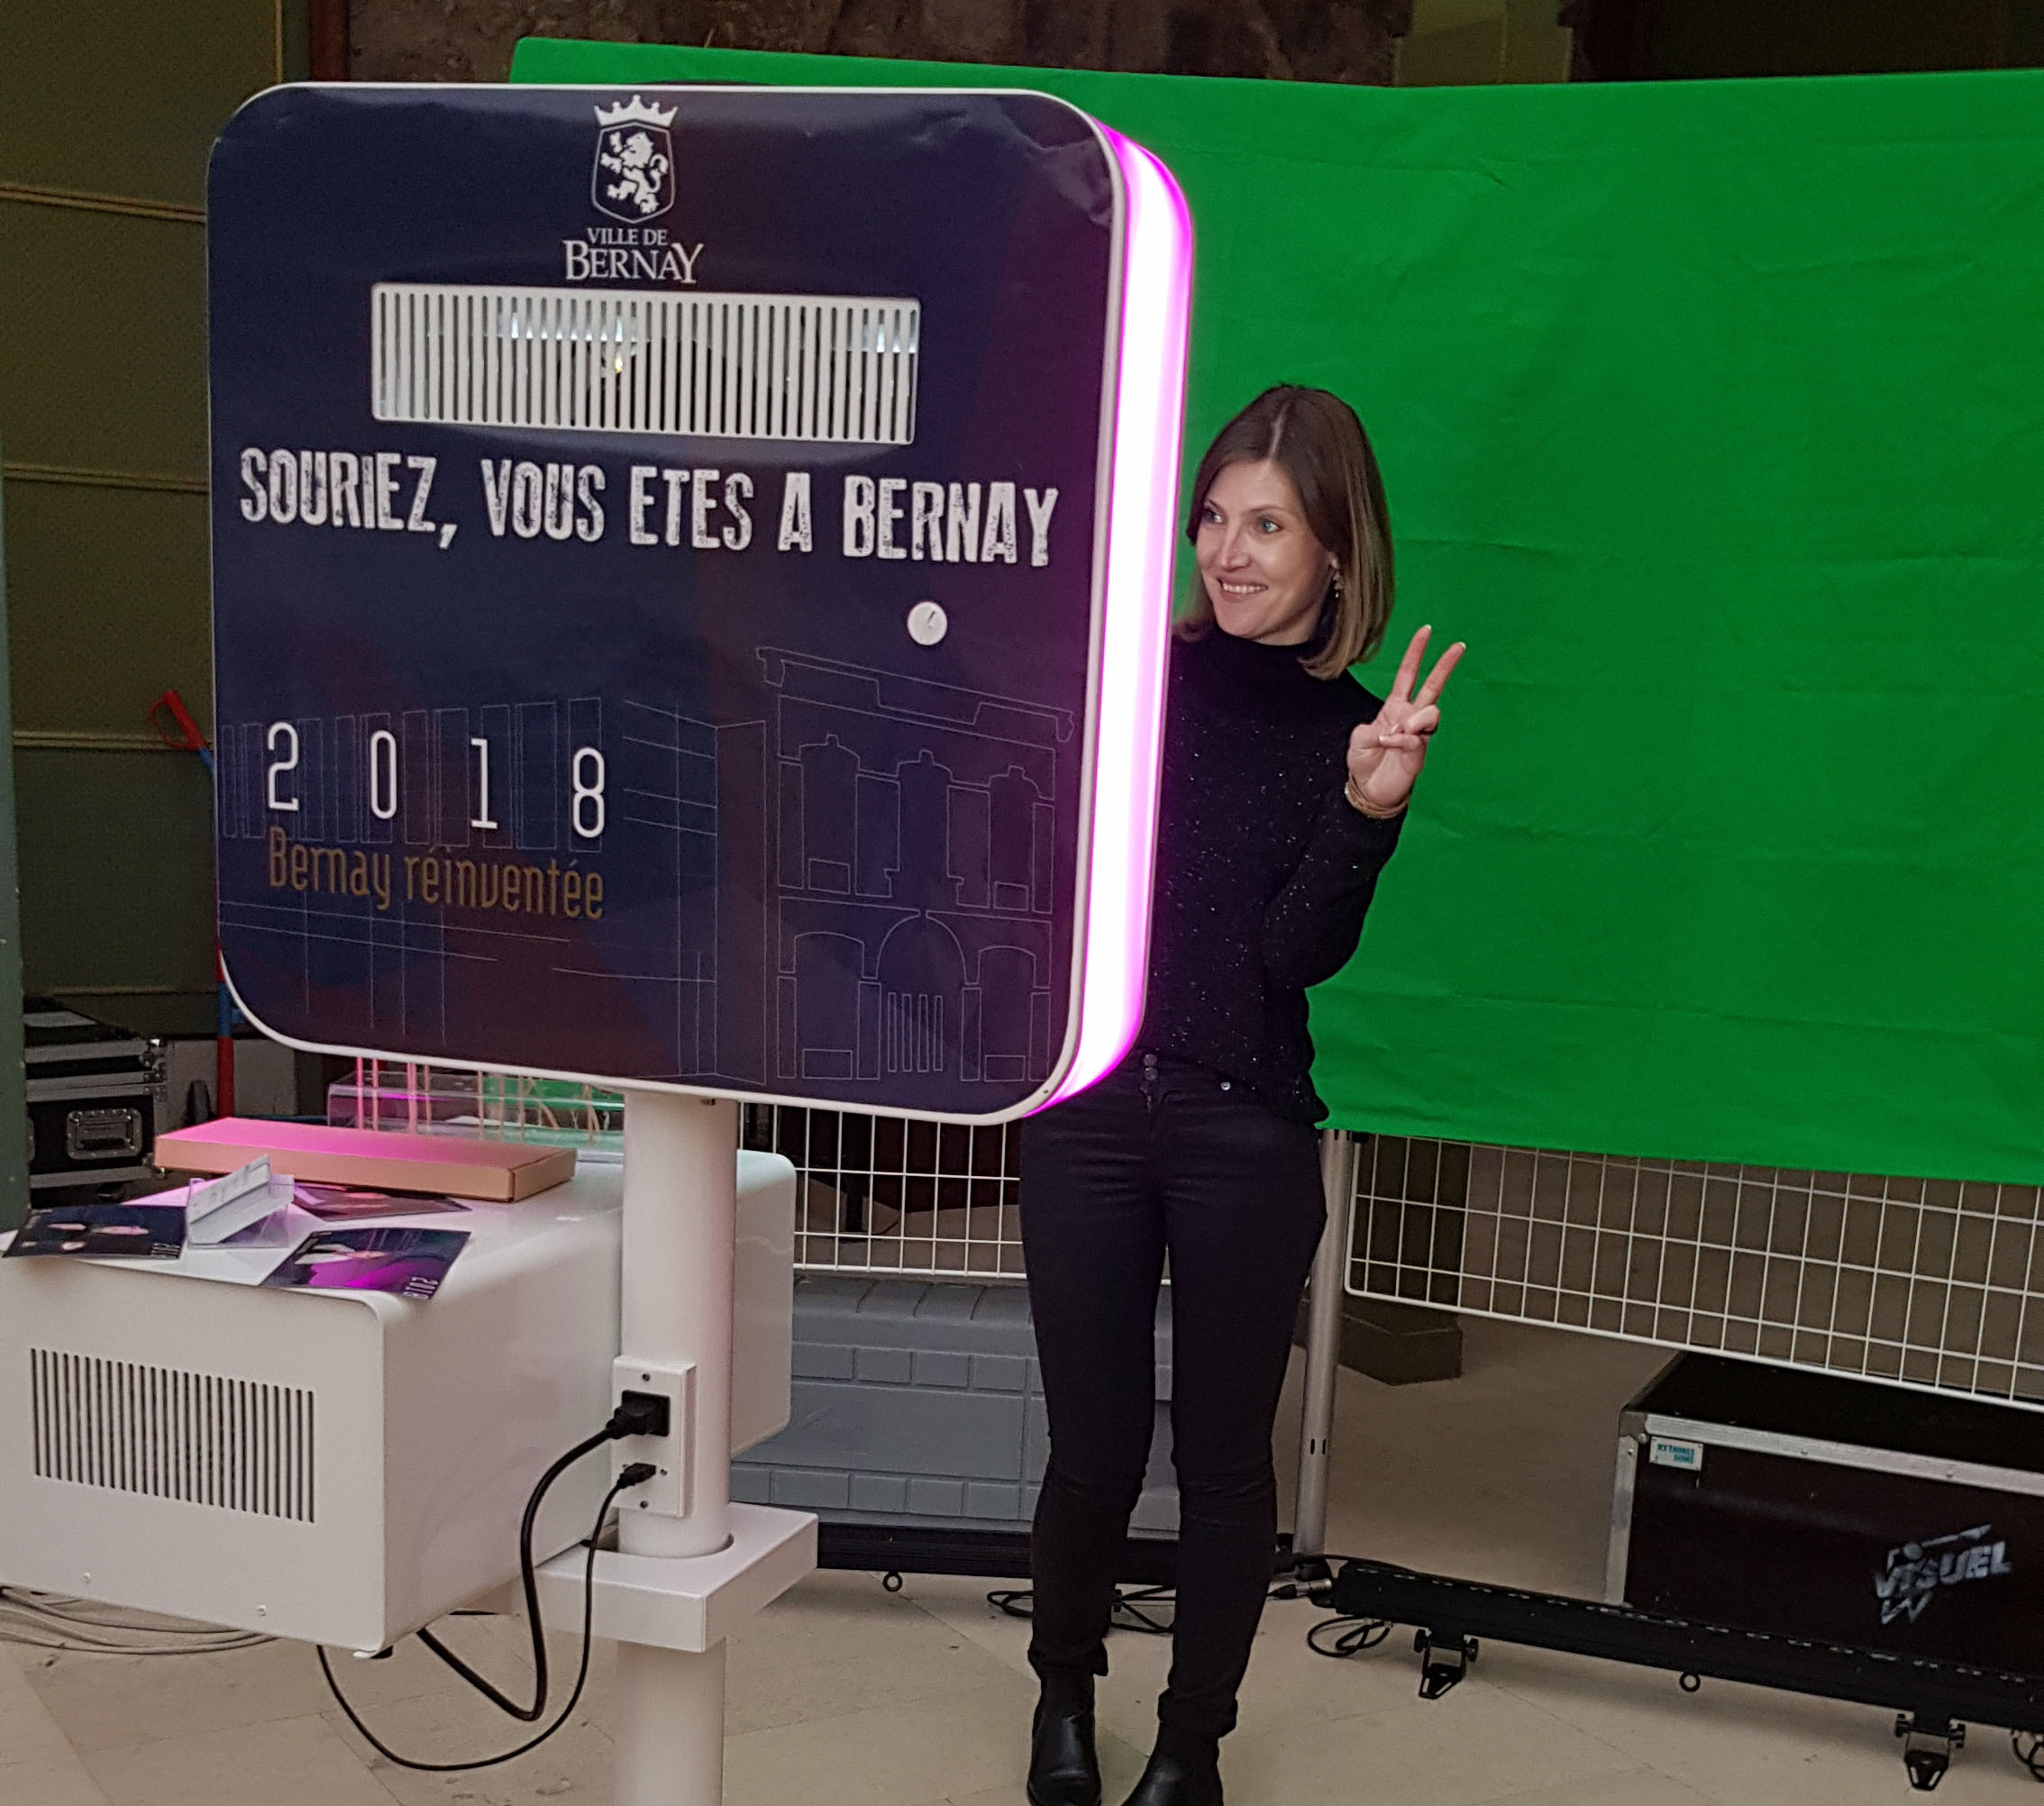 borne à selfie bernay voeux mairie normandie eure